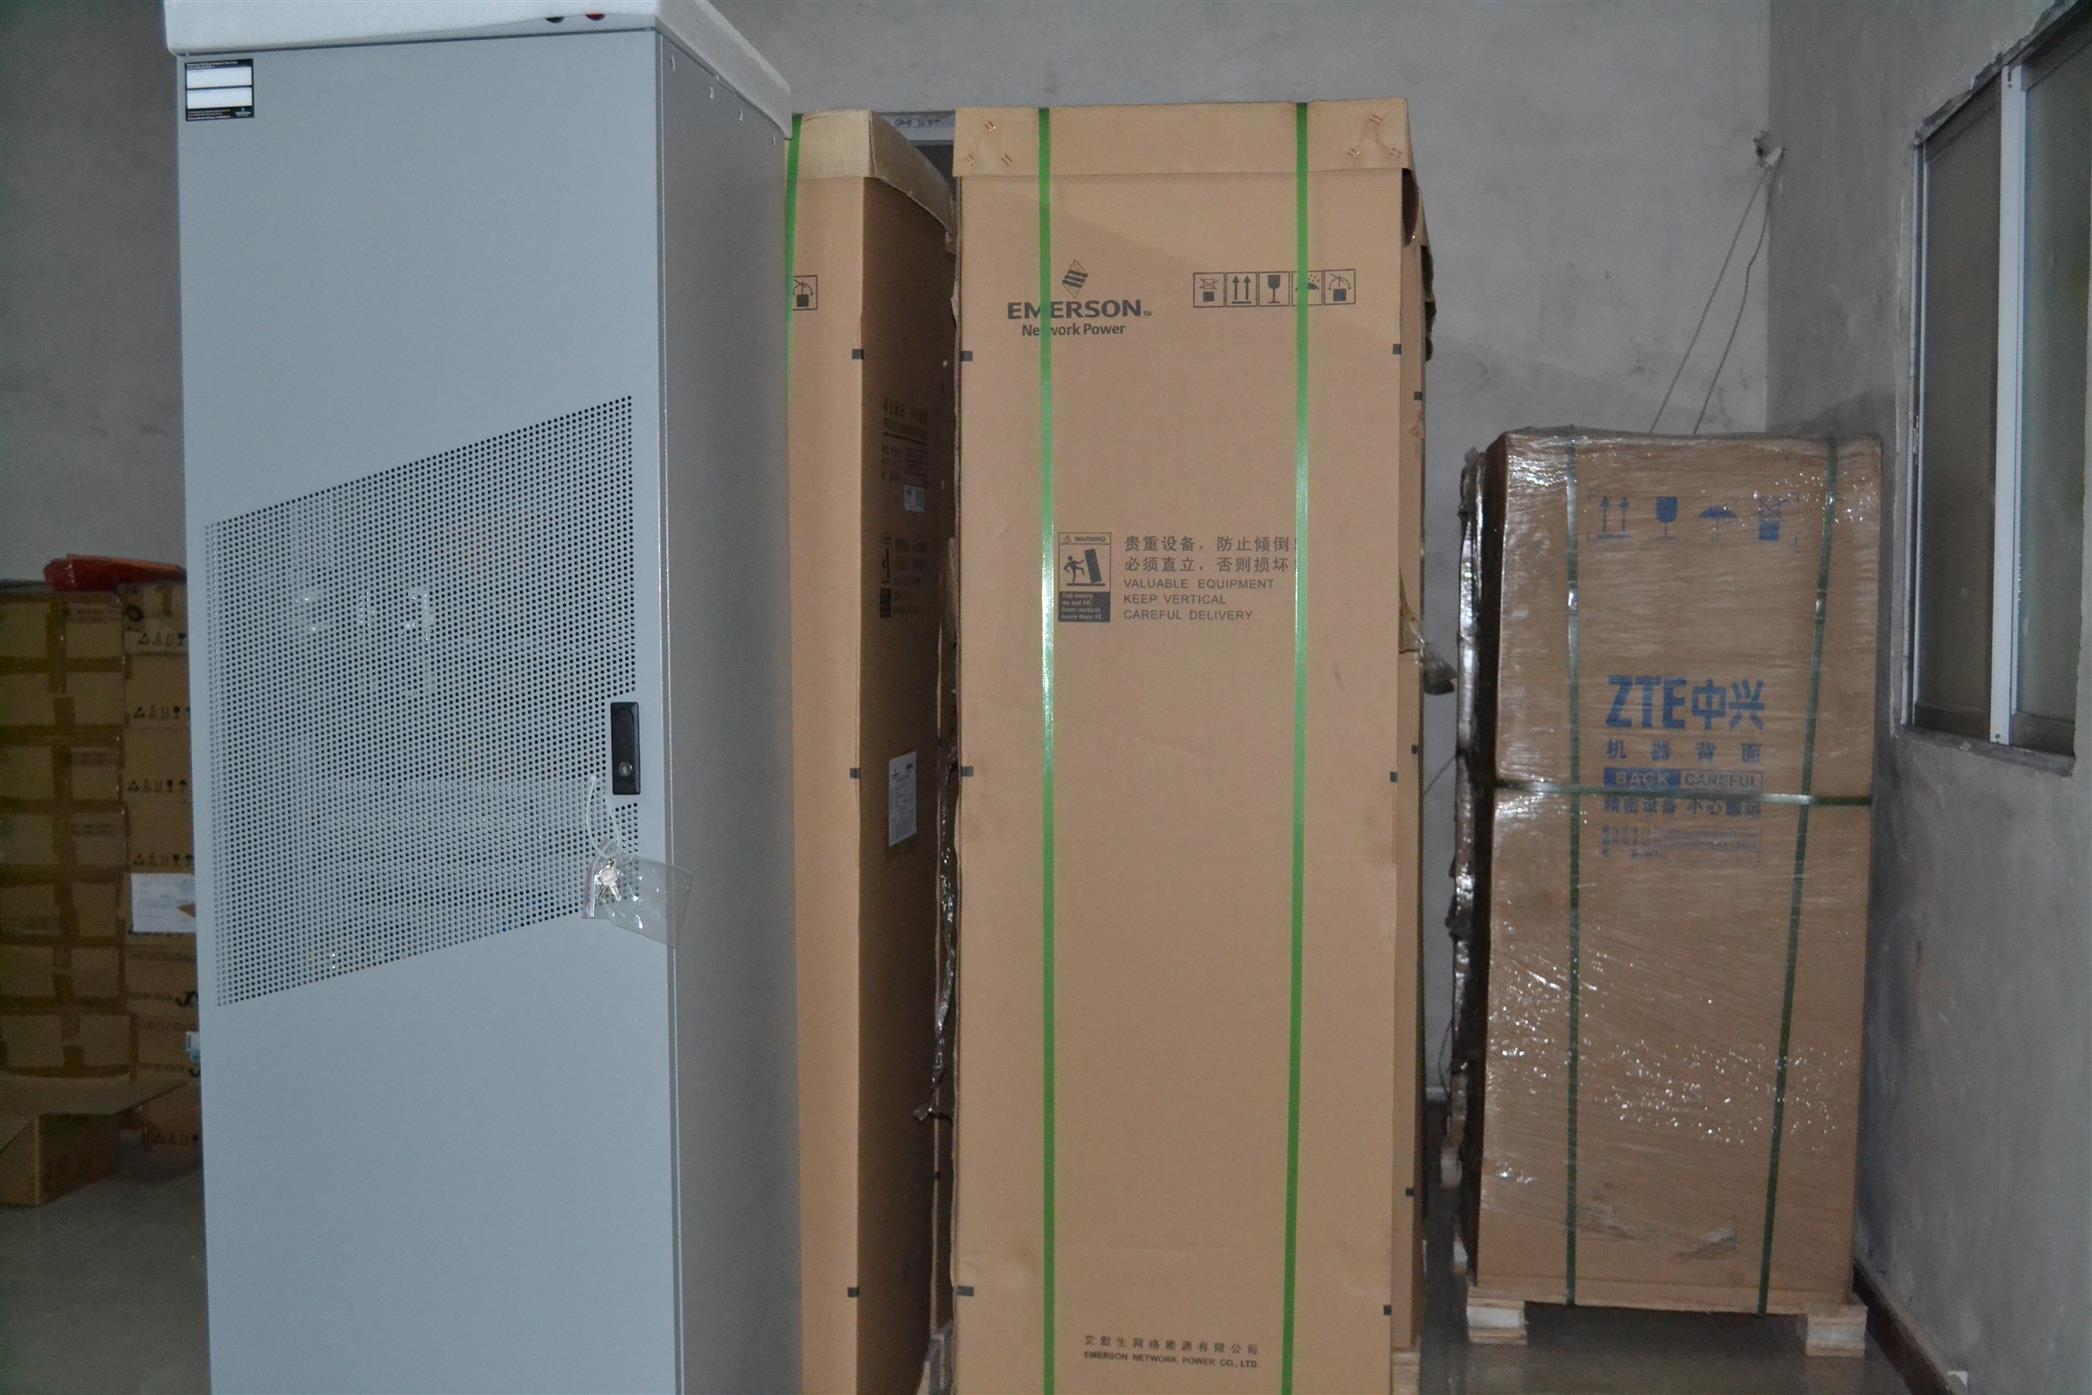 烏魯木齊EMERSONPS48300/1800 300A通信電源